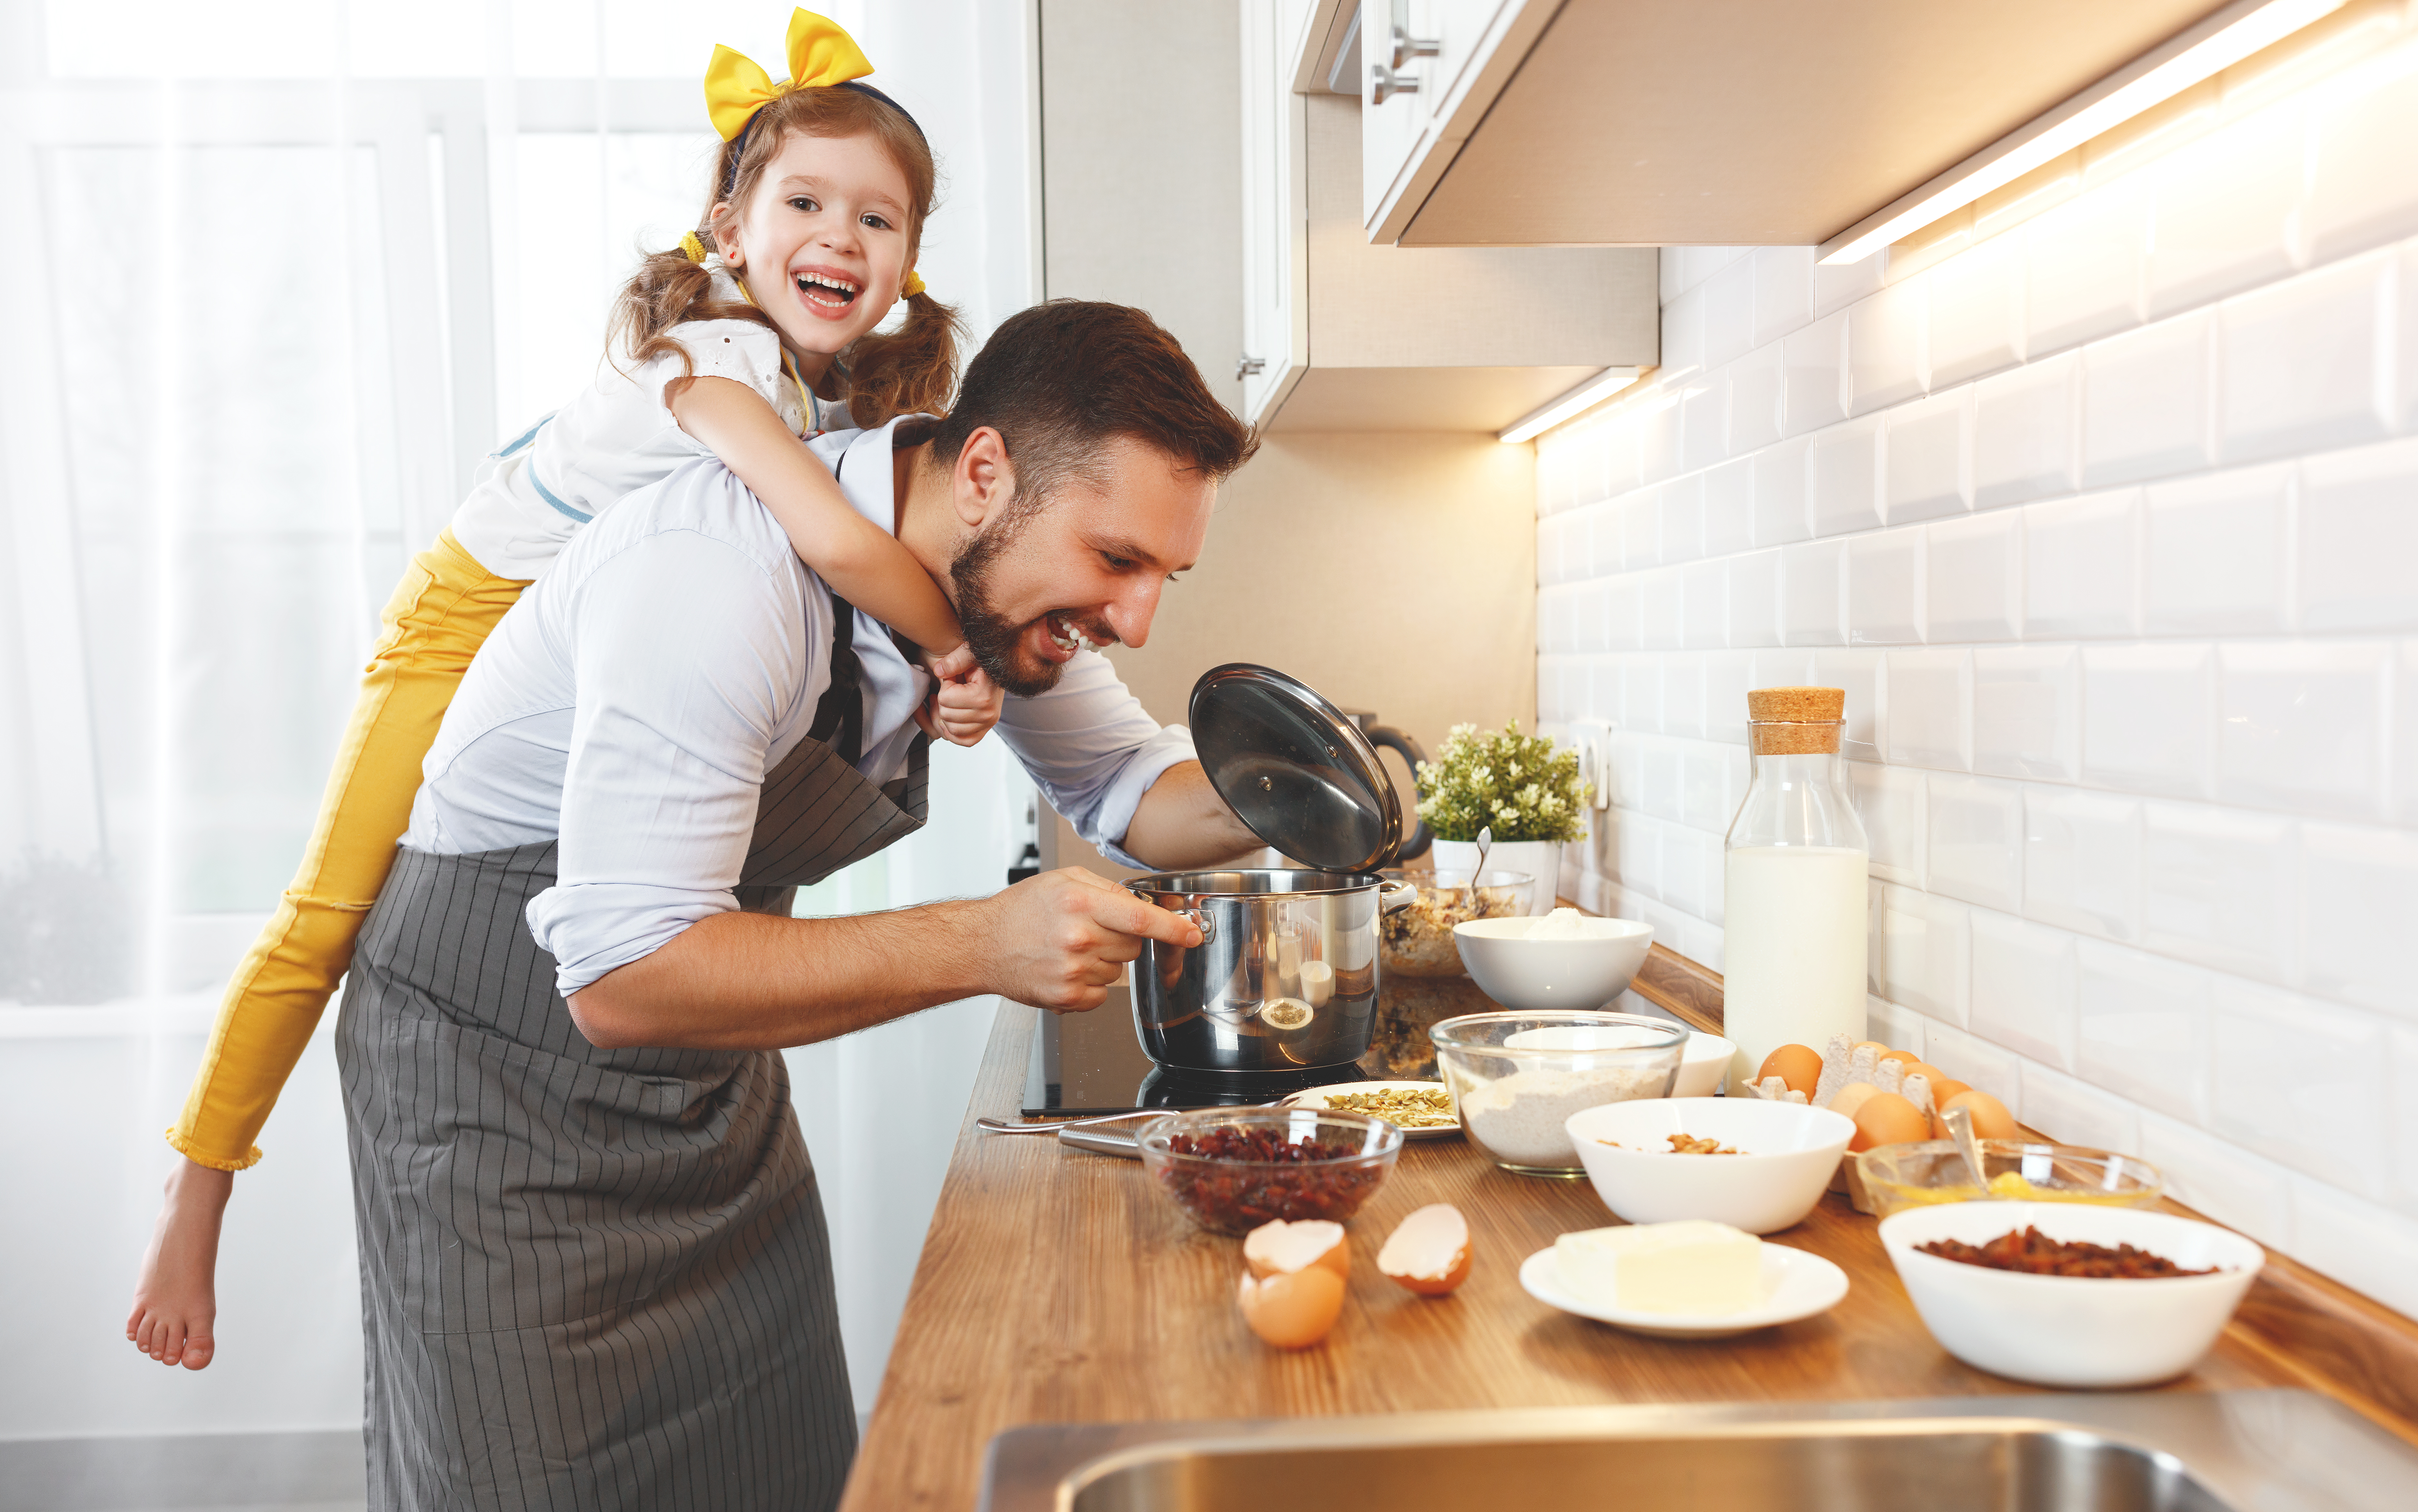 bigstock-Happy-Family-In-Kitchen-Fathe-2